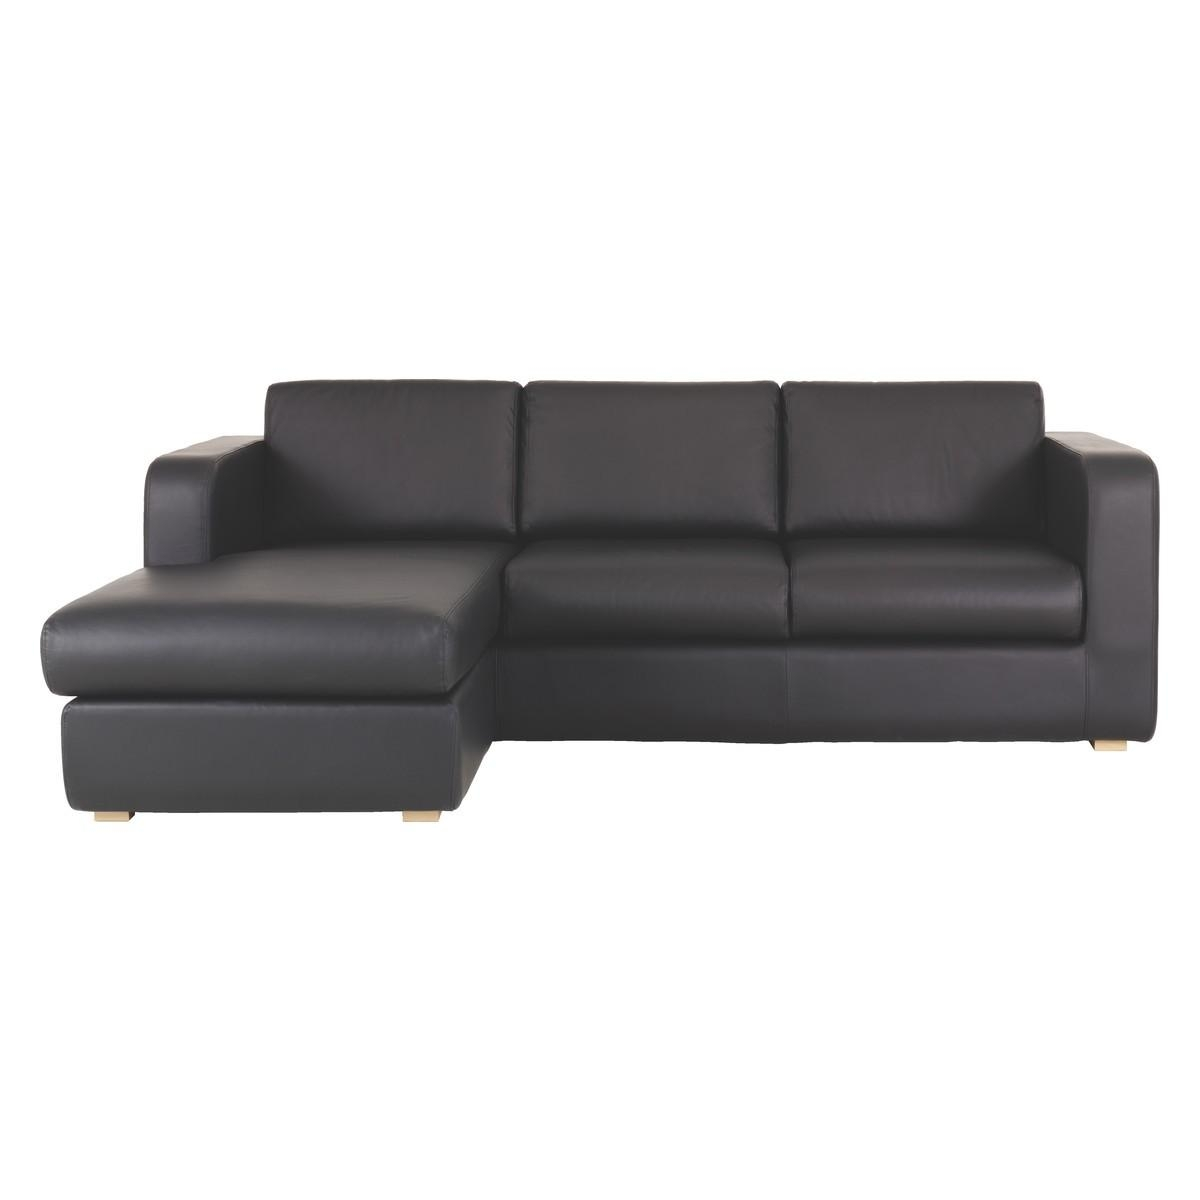 sofa bed corner sale how to repair fabric tear 20 best ideas